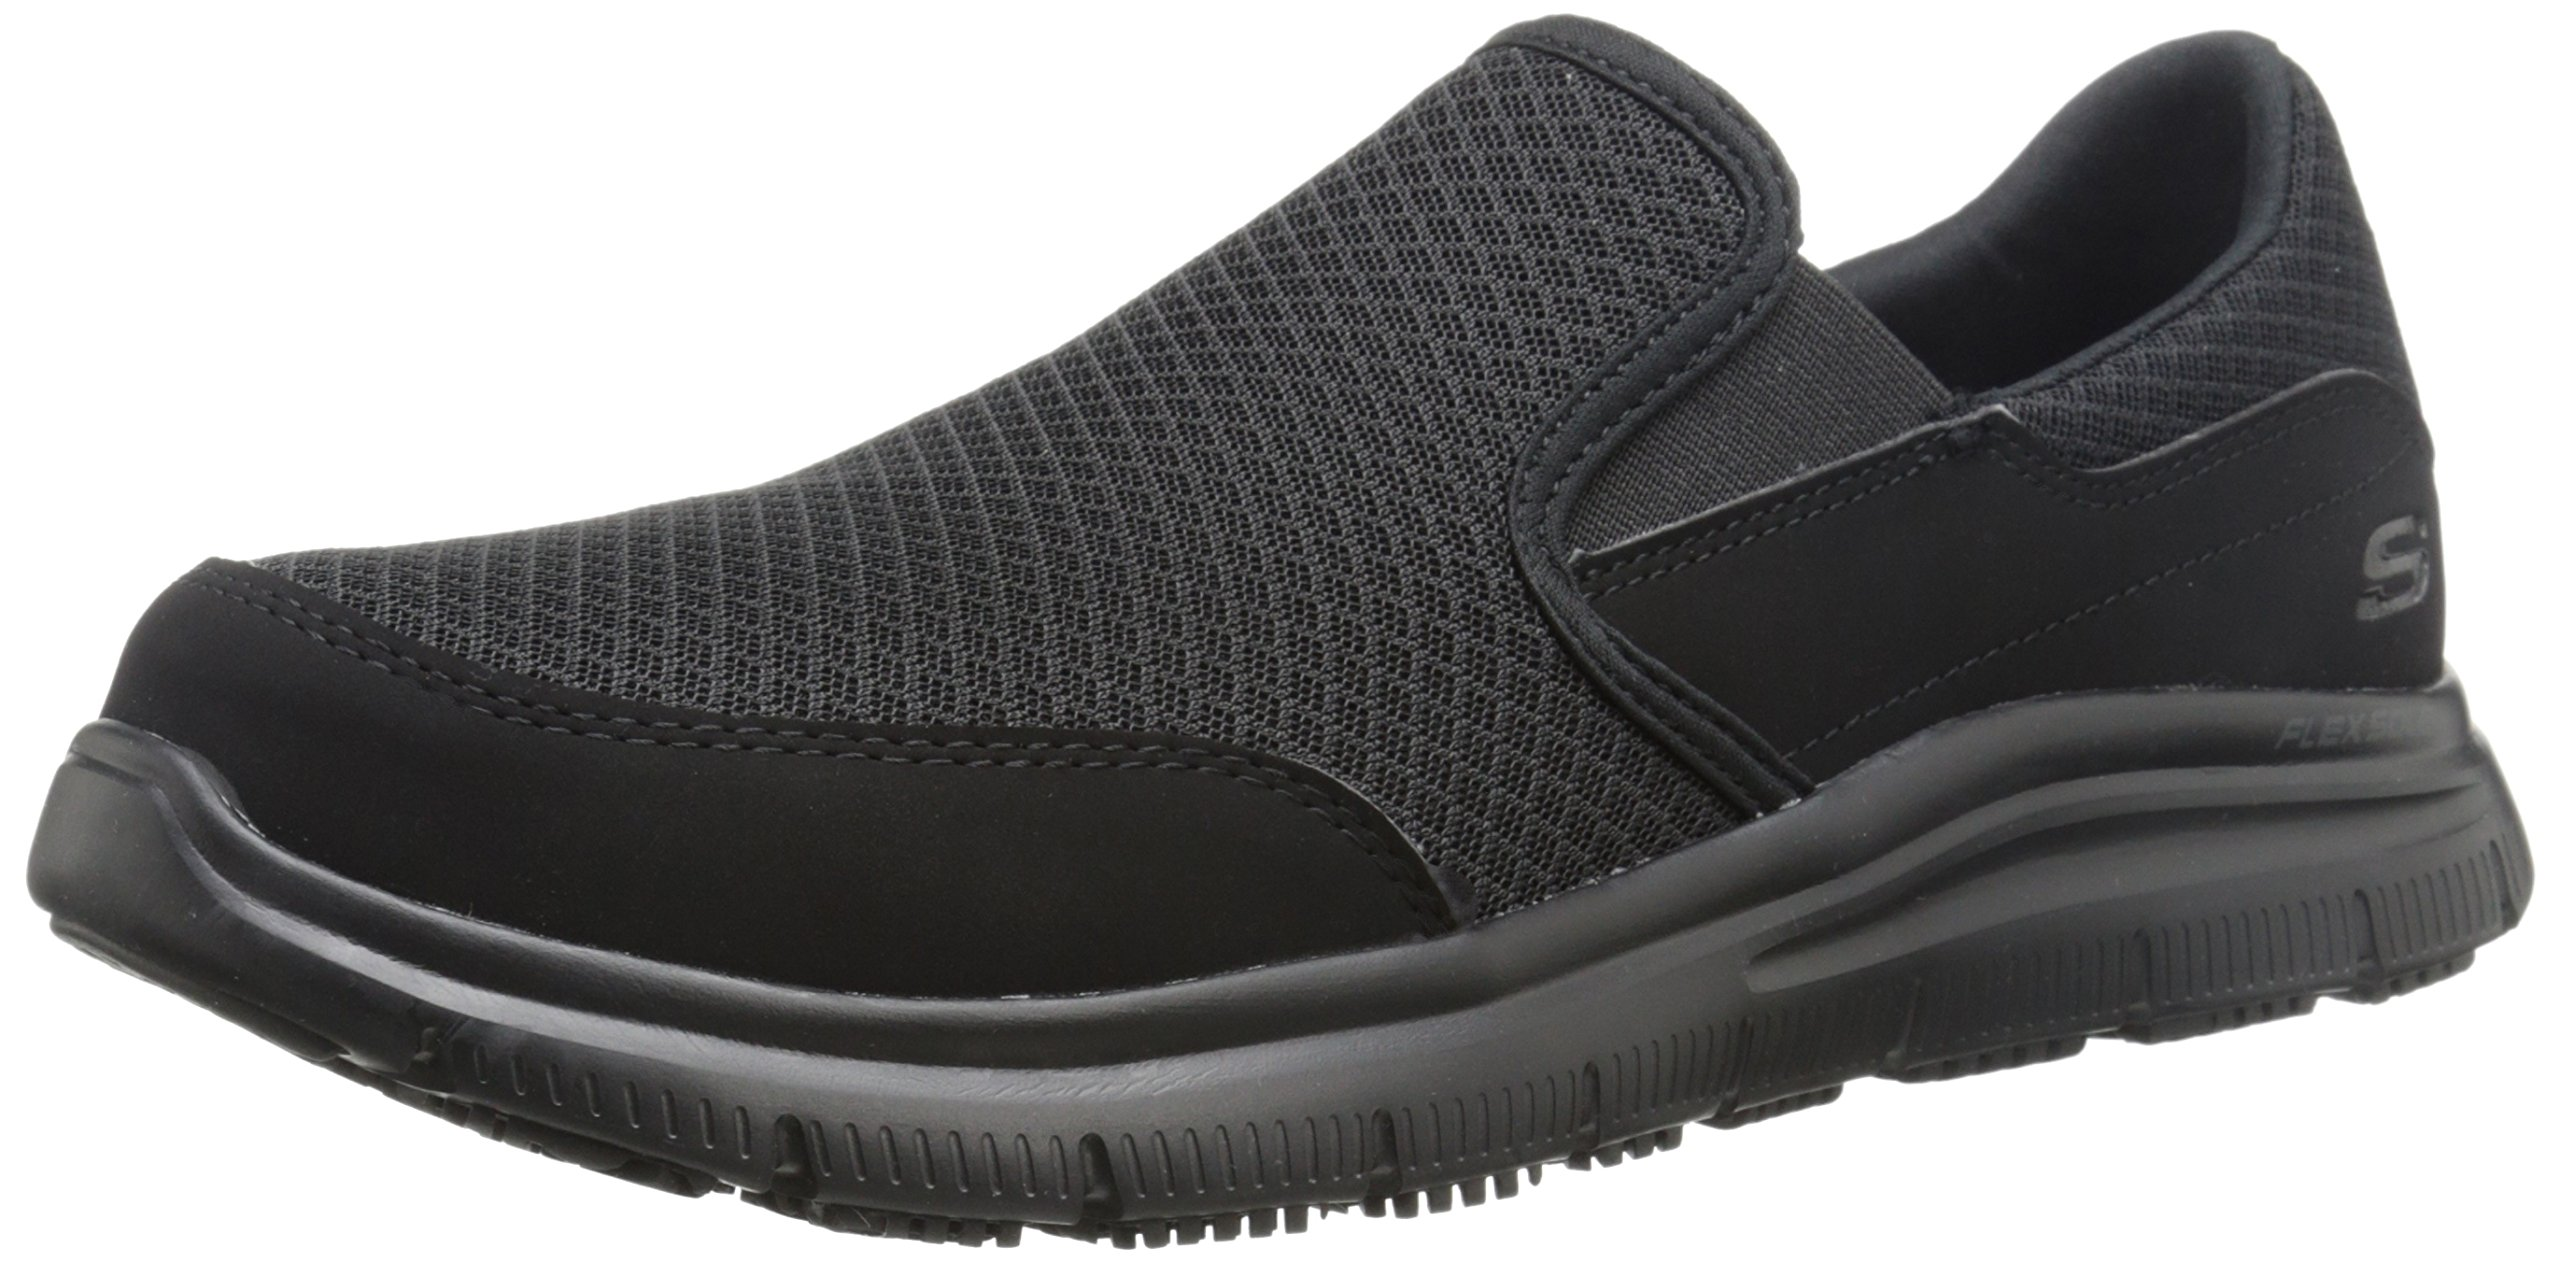 Skechers Men's Black Flex Advantage Slip Resistant Mcallen Slip On - 10.5 D(M) US by Skechers